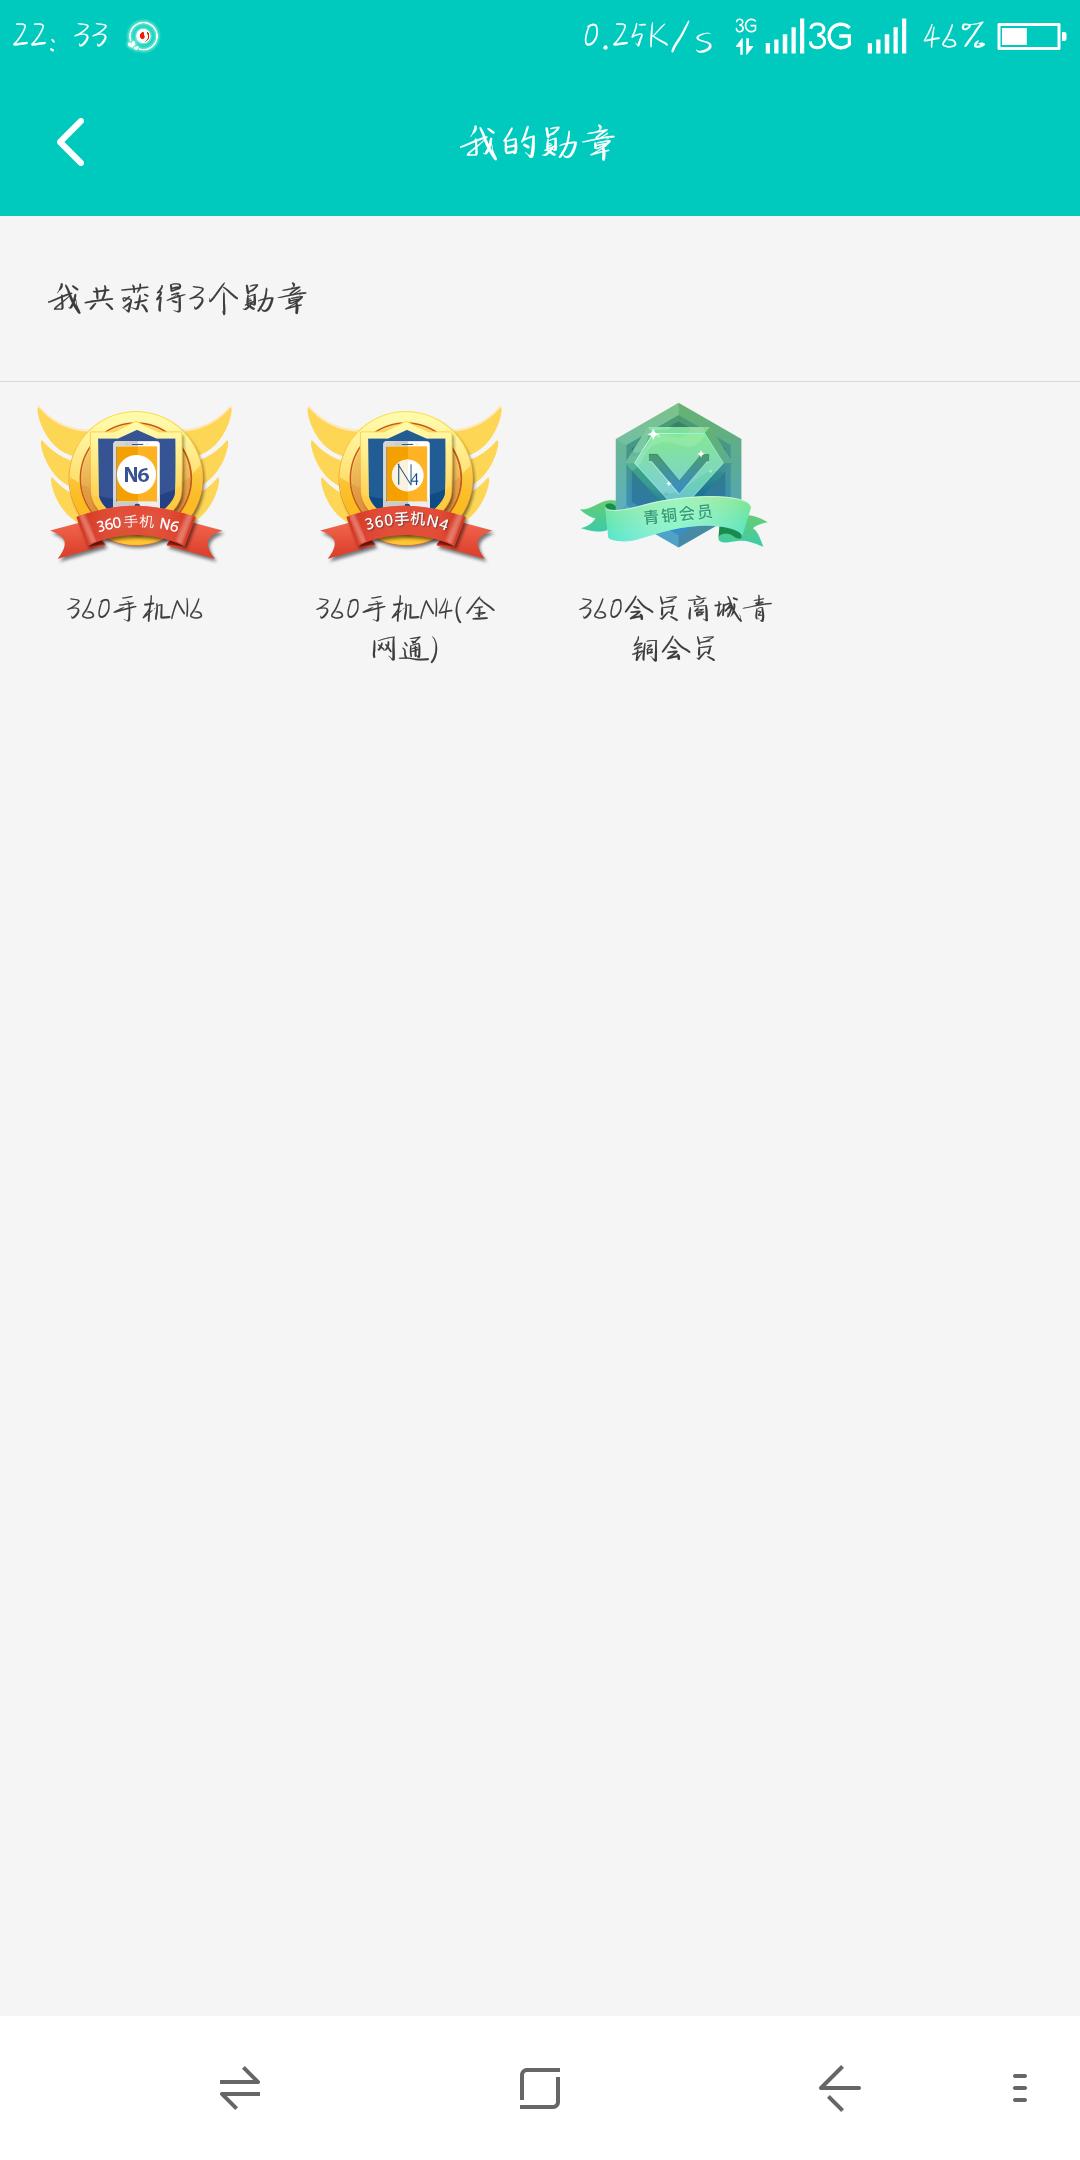 Screenshot_2019-09-01-22-33-02.png